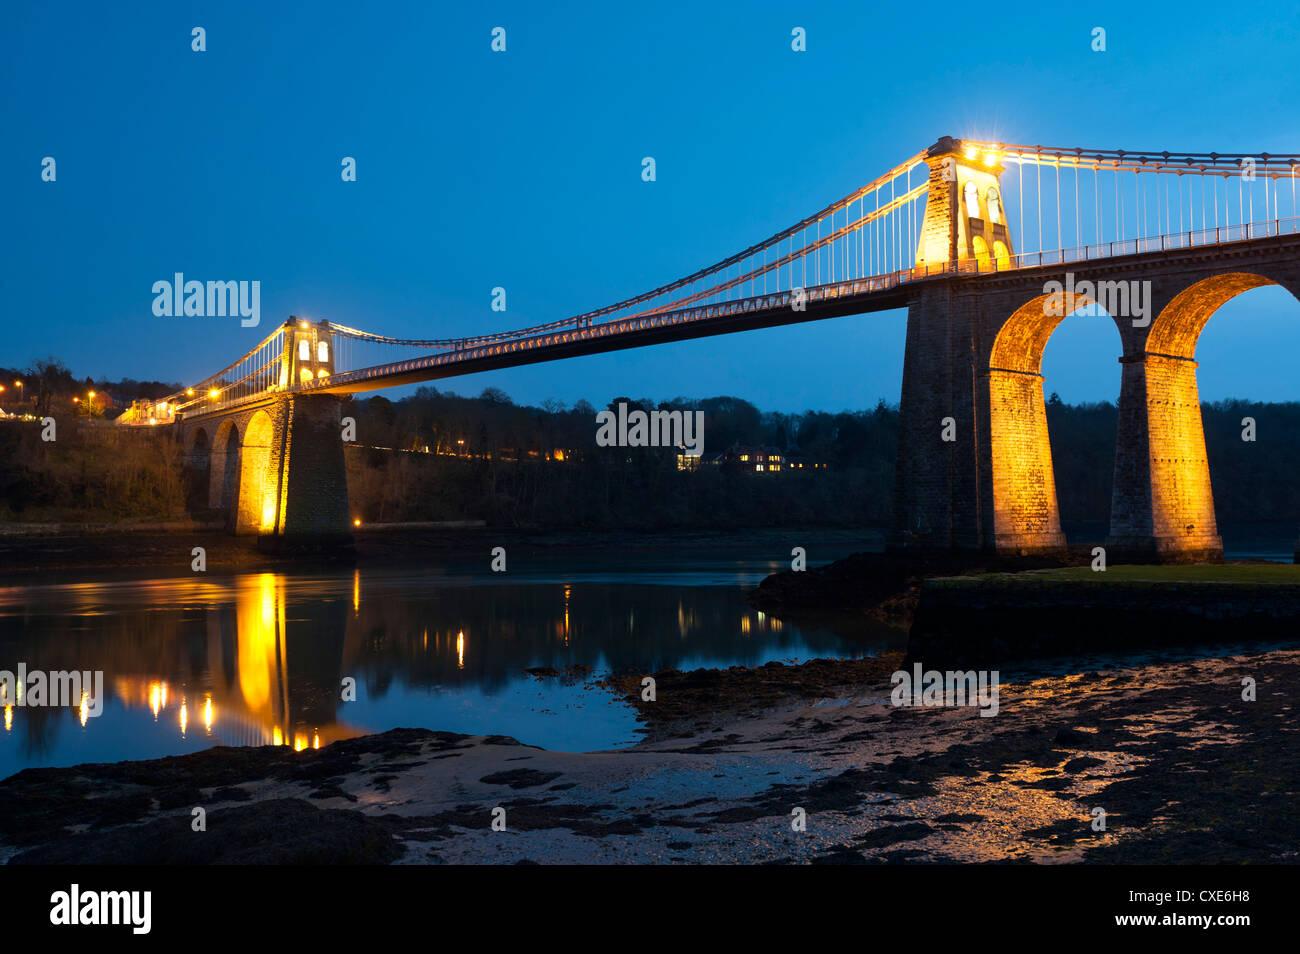 Menai Bridge illuminated at dusk, Gwynedd, Anglesey, North Wales, Wales, United Kingdom, Europe - Stock Image